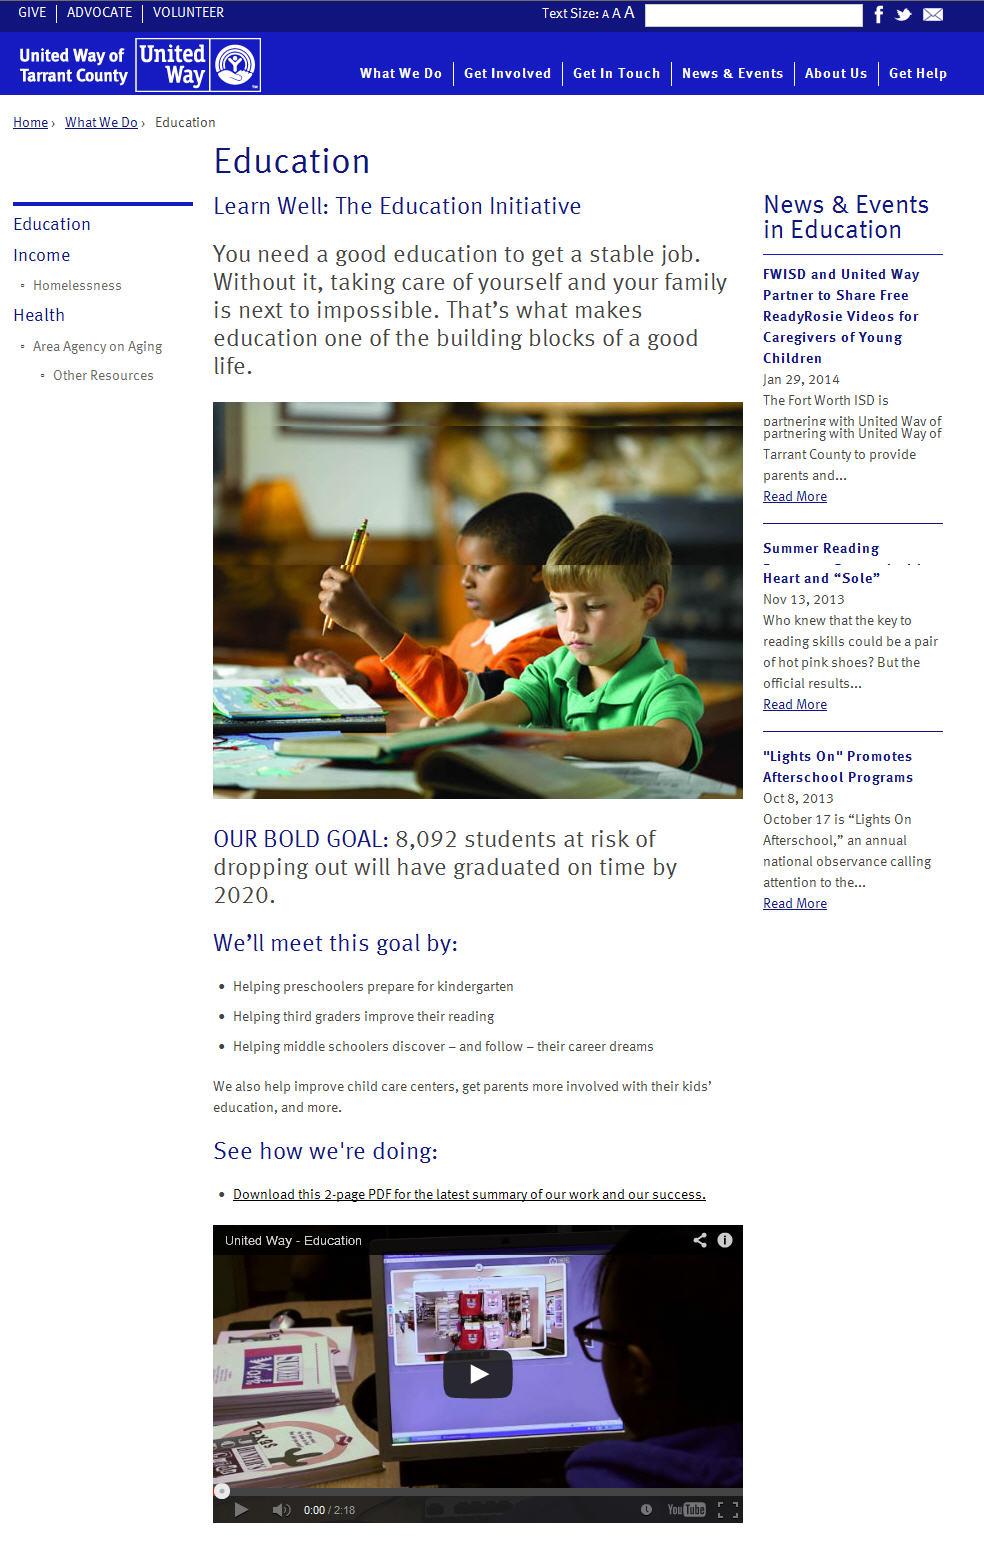 UW Tarrant County Education Web Page.jpg